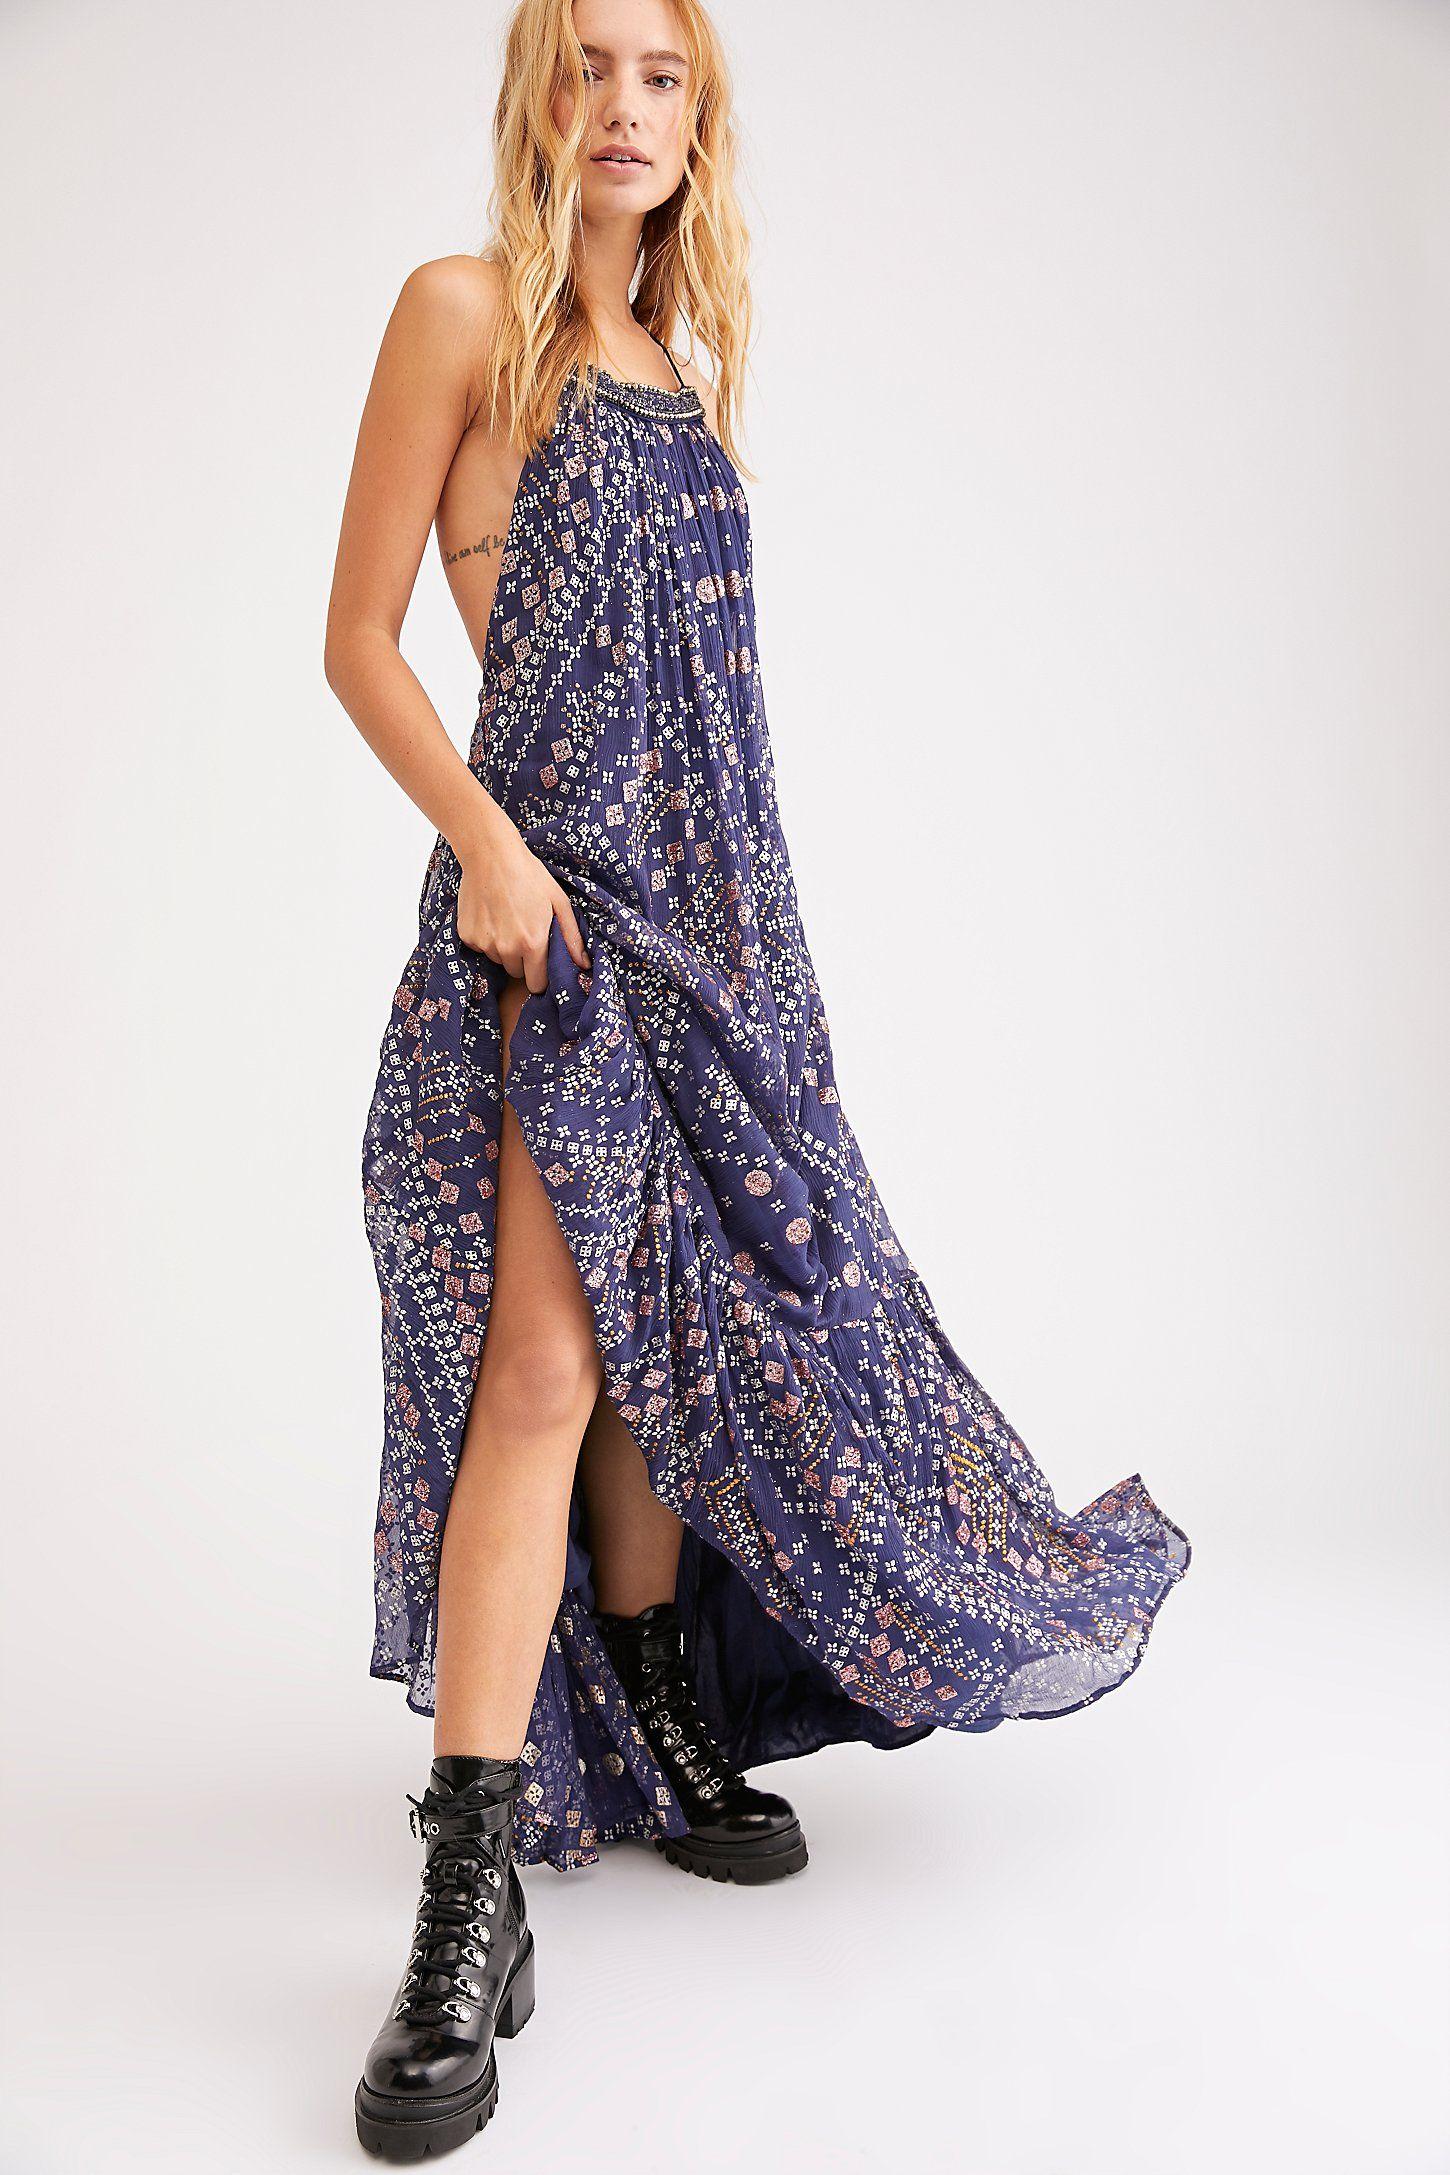 6c477a05cb So Fancy Maxi Dress